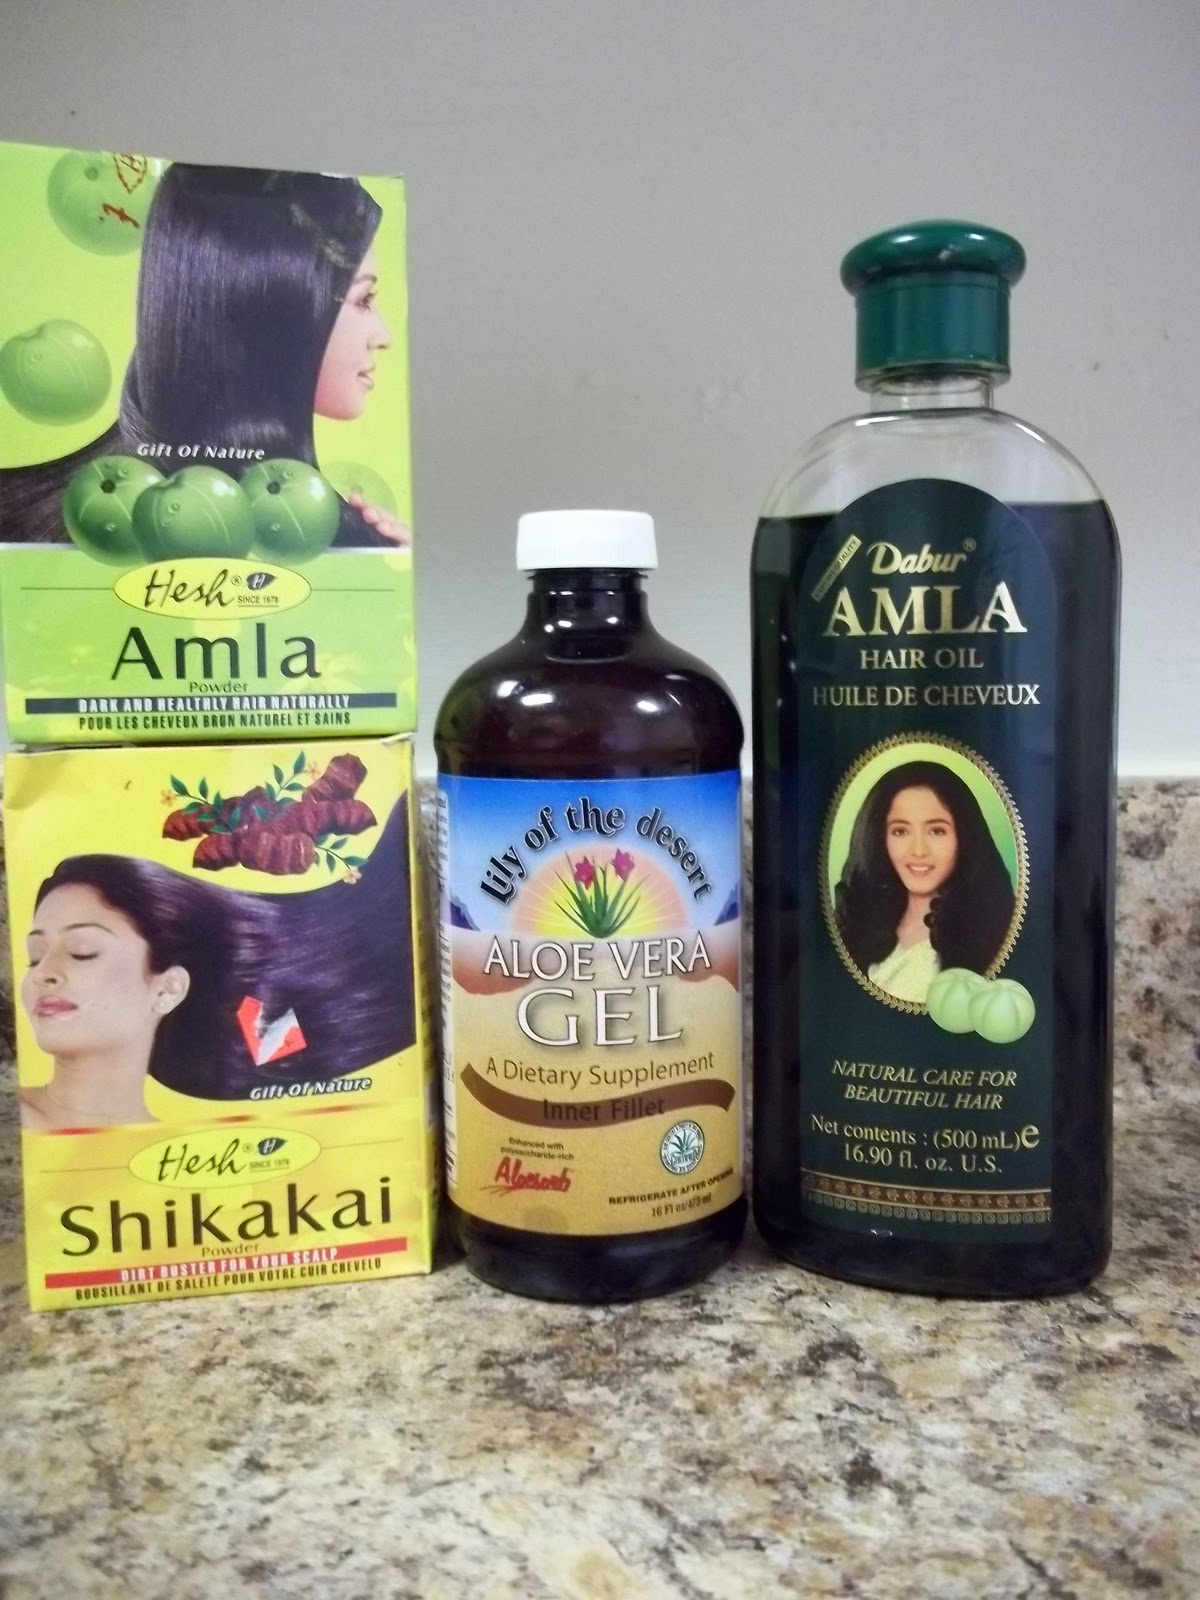 how to use shikakai powder as shampoo